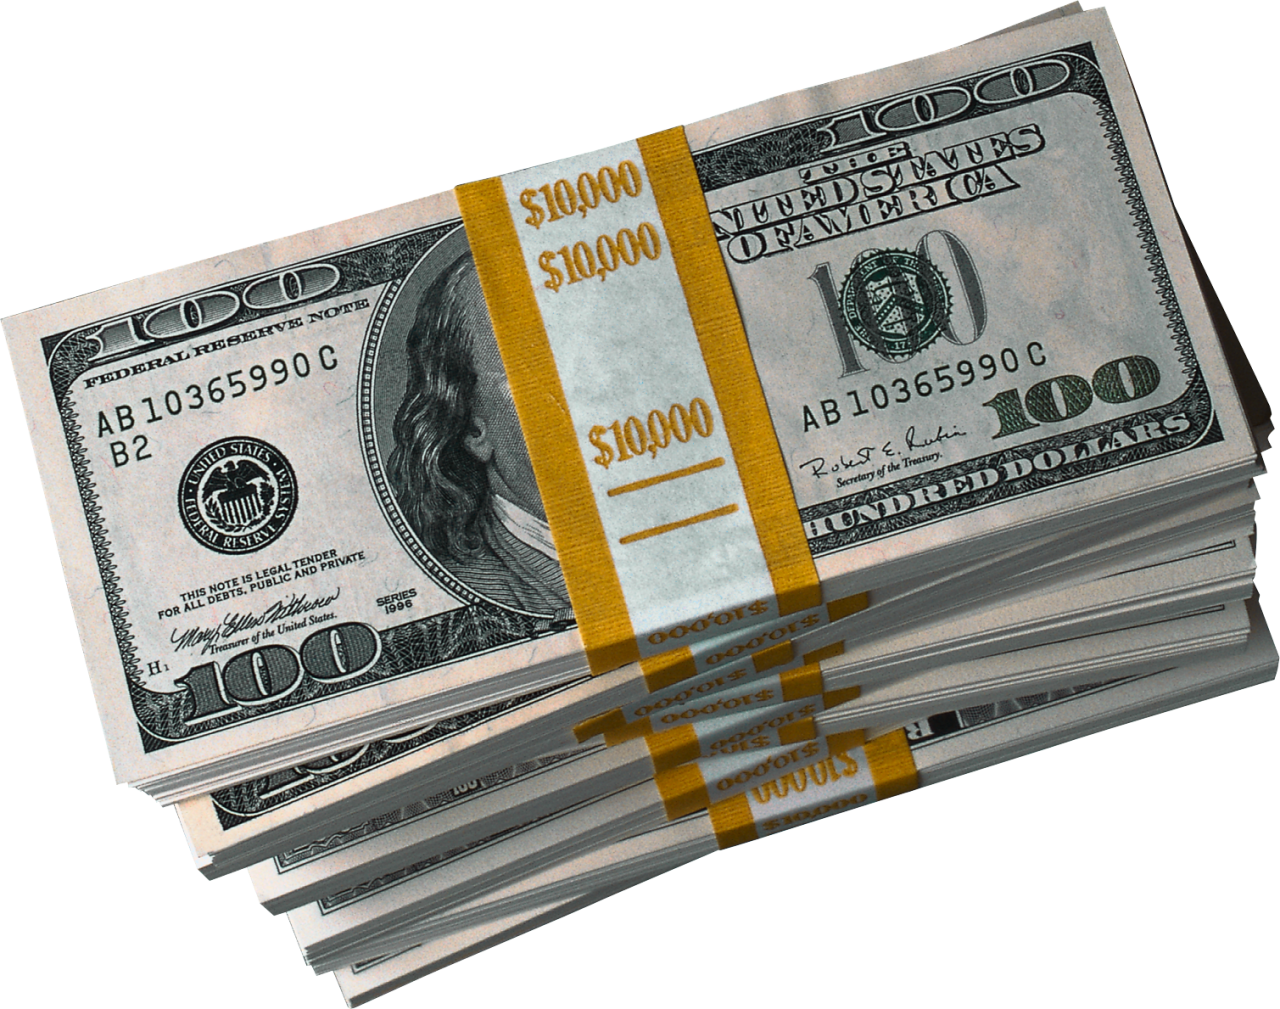 Money's PNG Image - PurePNG | Free transparent CC0 PNG ...